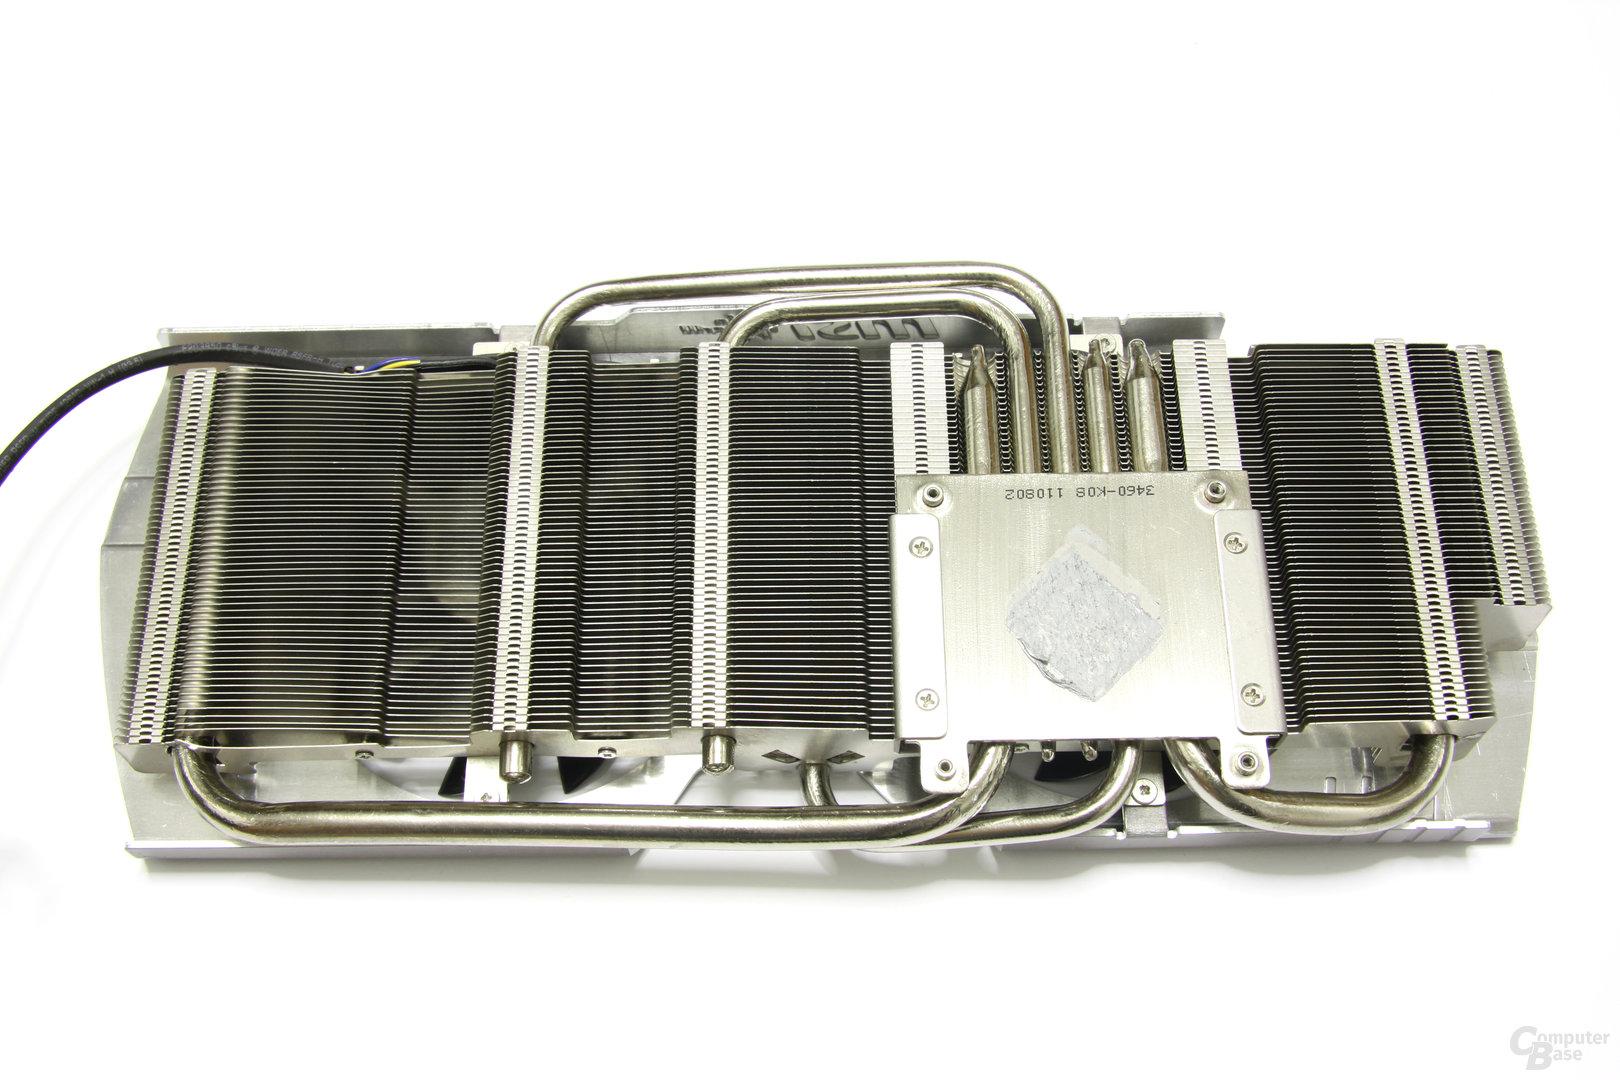 Radeon HD 6970 Lightning Kühlerrückseite